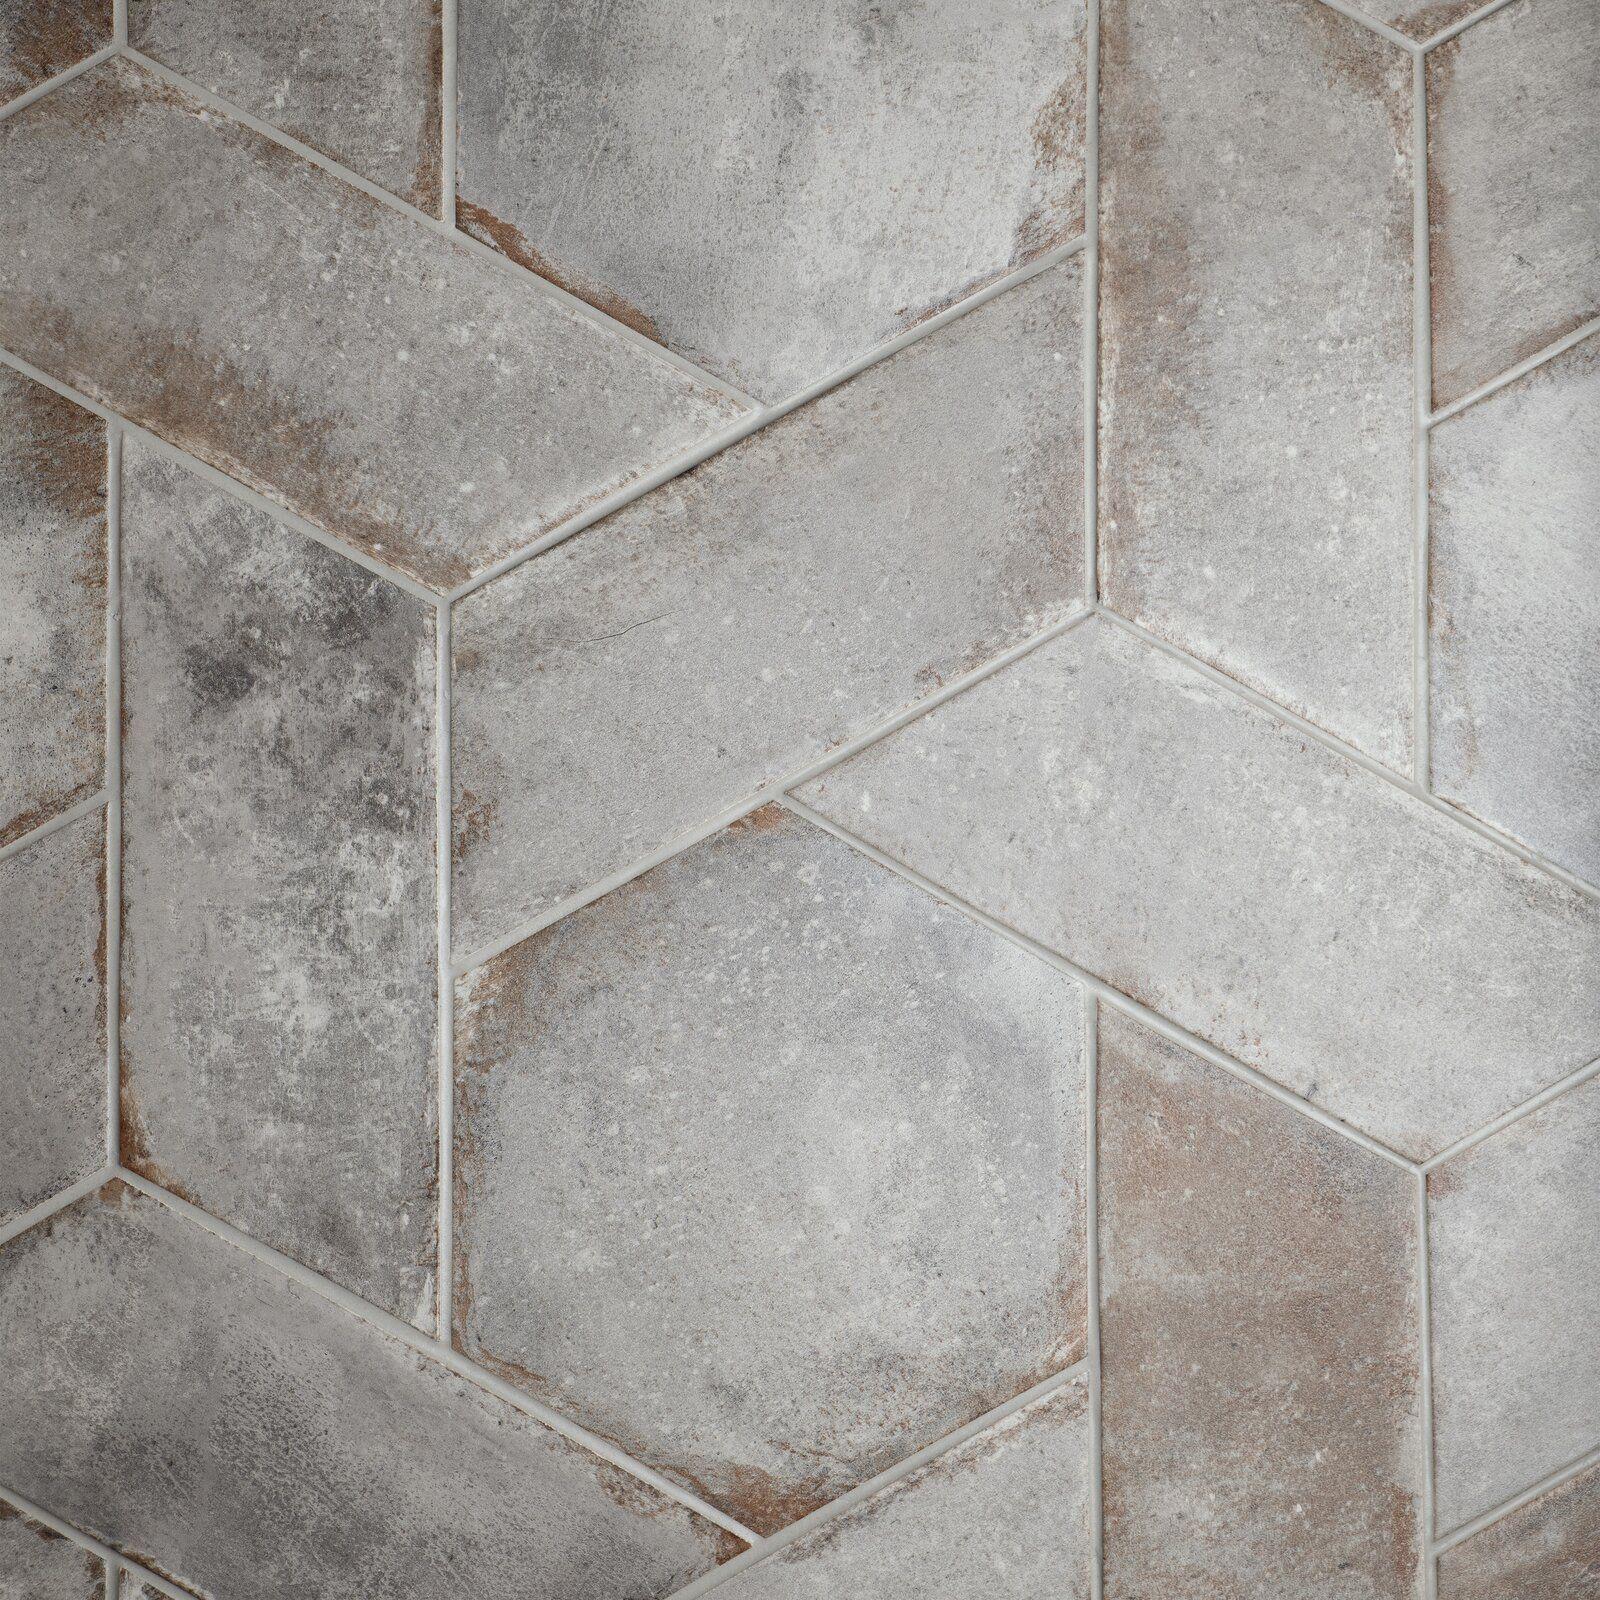 Relic 11 X 13 Field Tile Tile Floor Porcelain Flooring Floor And Wall Tile